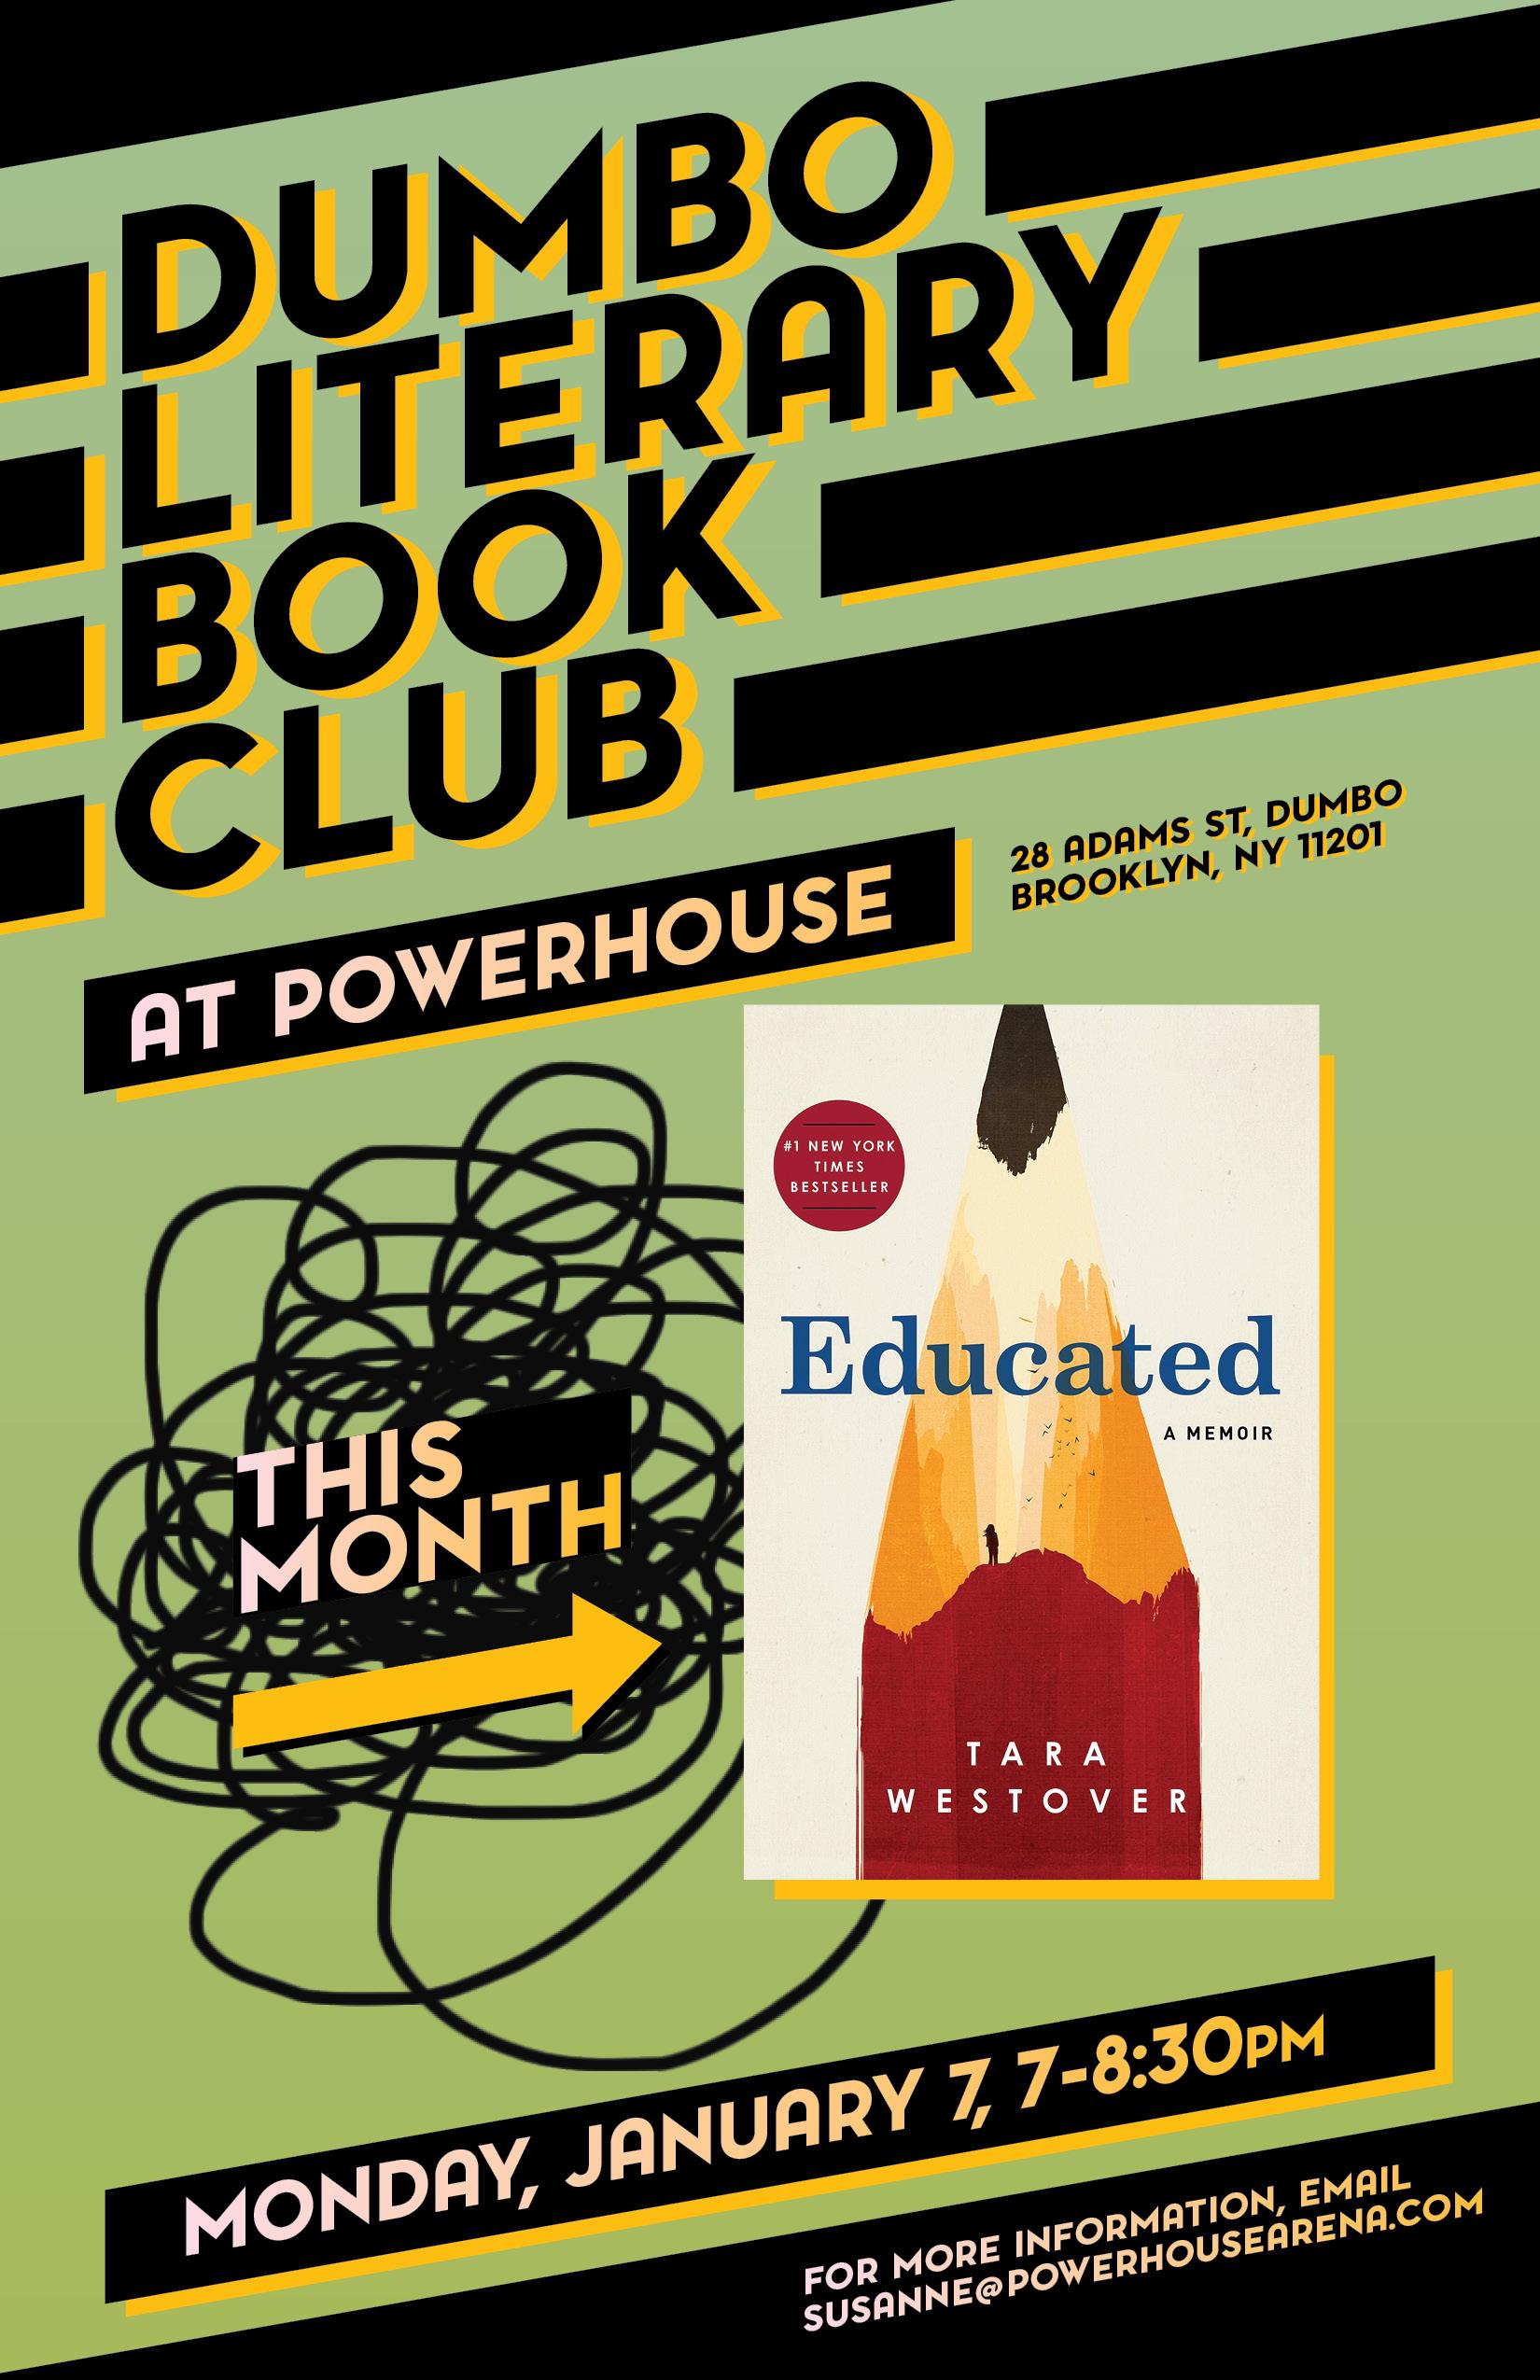 Dumbo Lit Book Club: Educated by Tara Westover